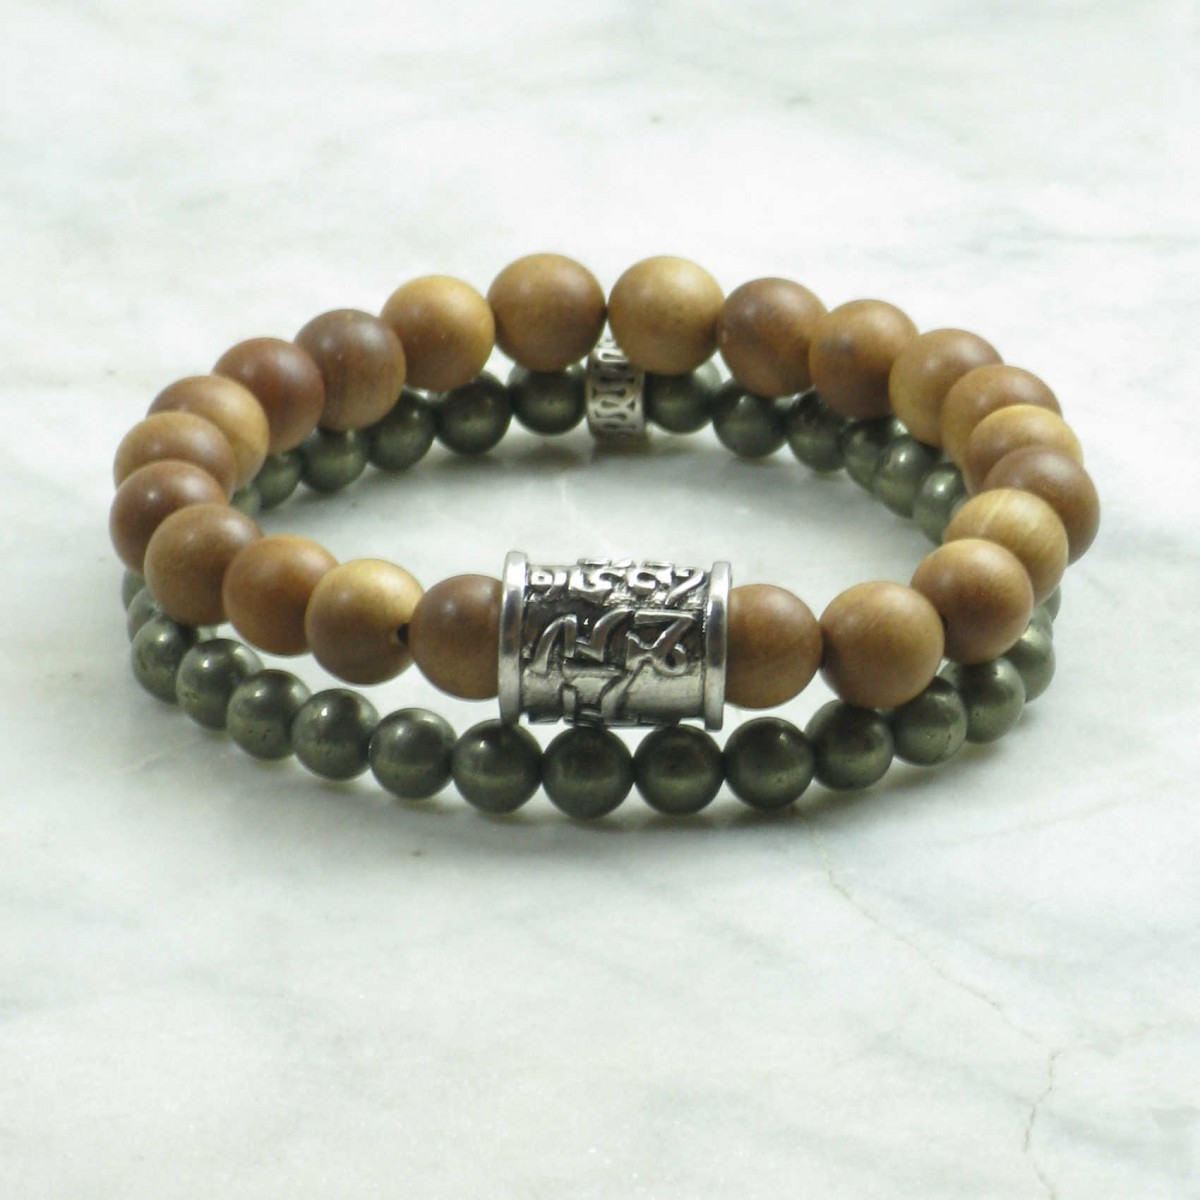 Peace_Bracelets_for_Men_Mala_Beads_Stacks_Sandalwood_Pyrite_Coconut_Buddhist_Prayer_Beads